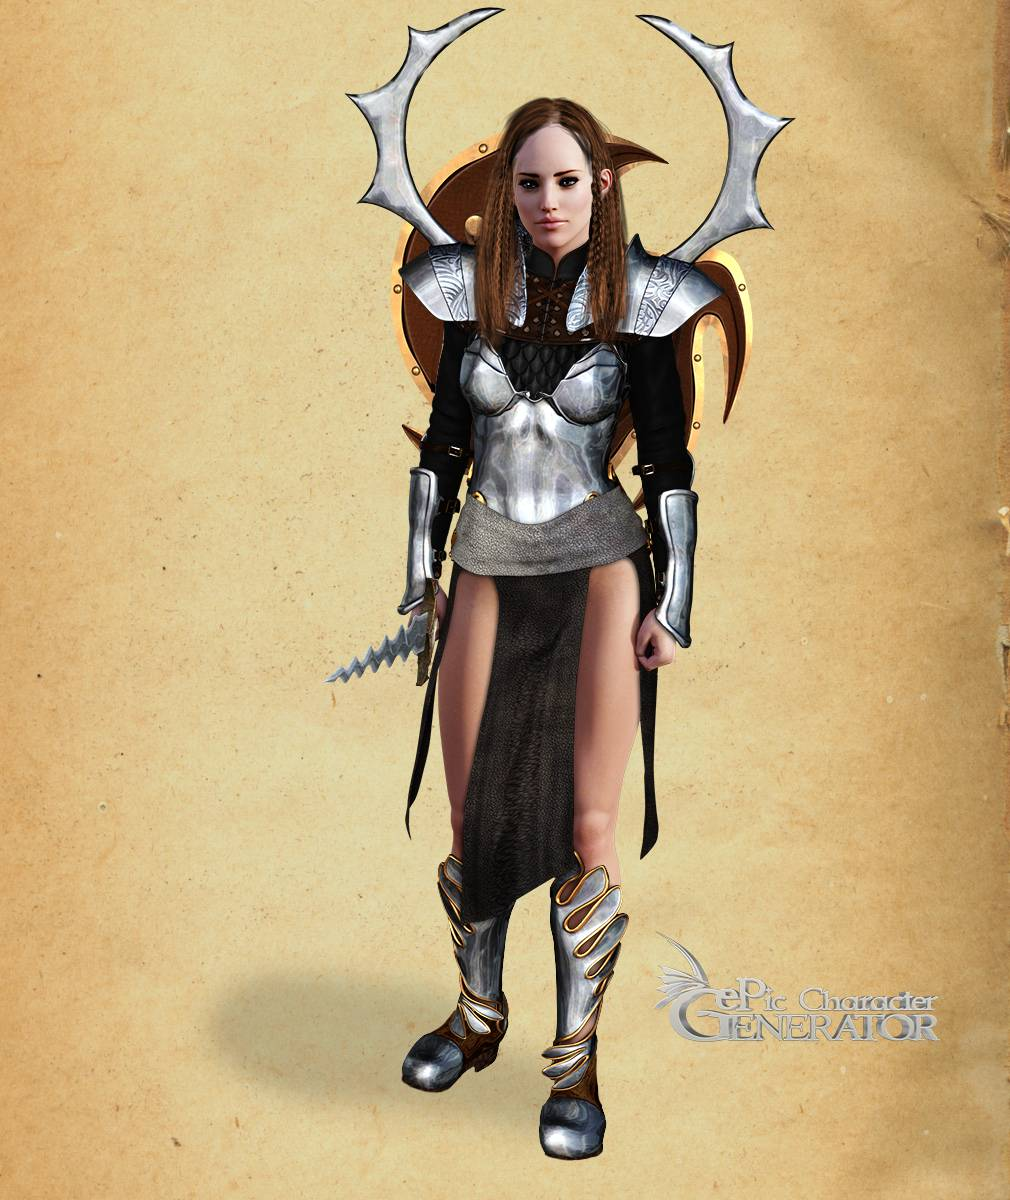 ePic Character Generator Season 2 Female Warrior Screenshot 02